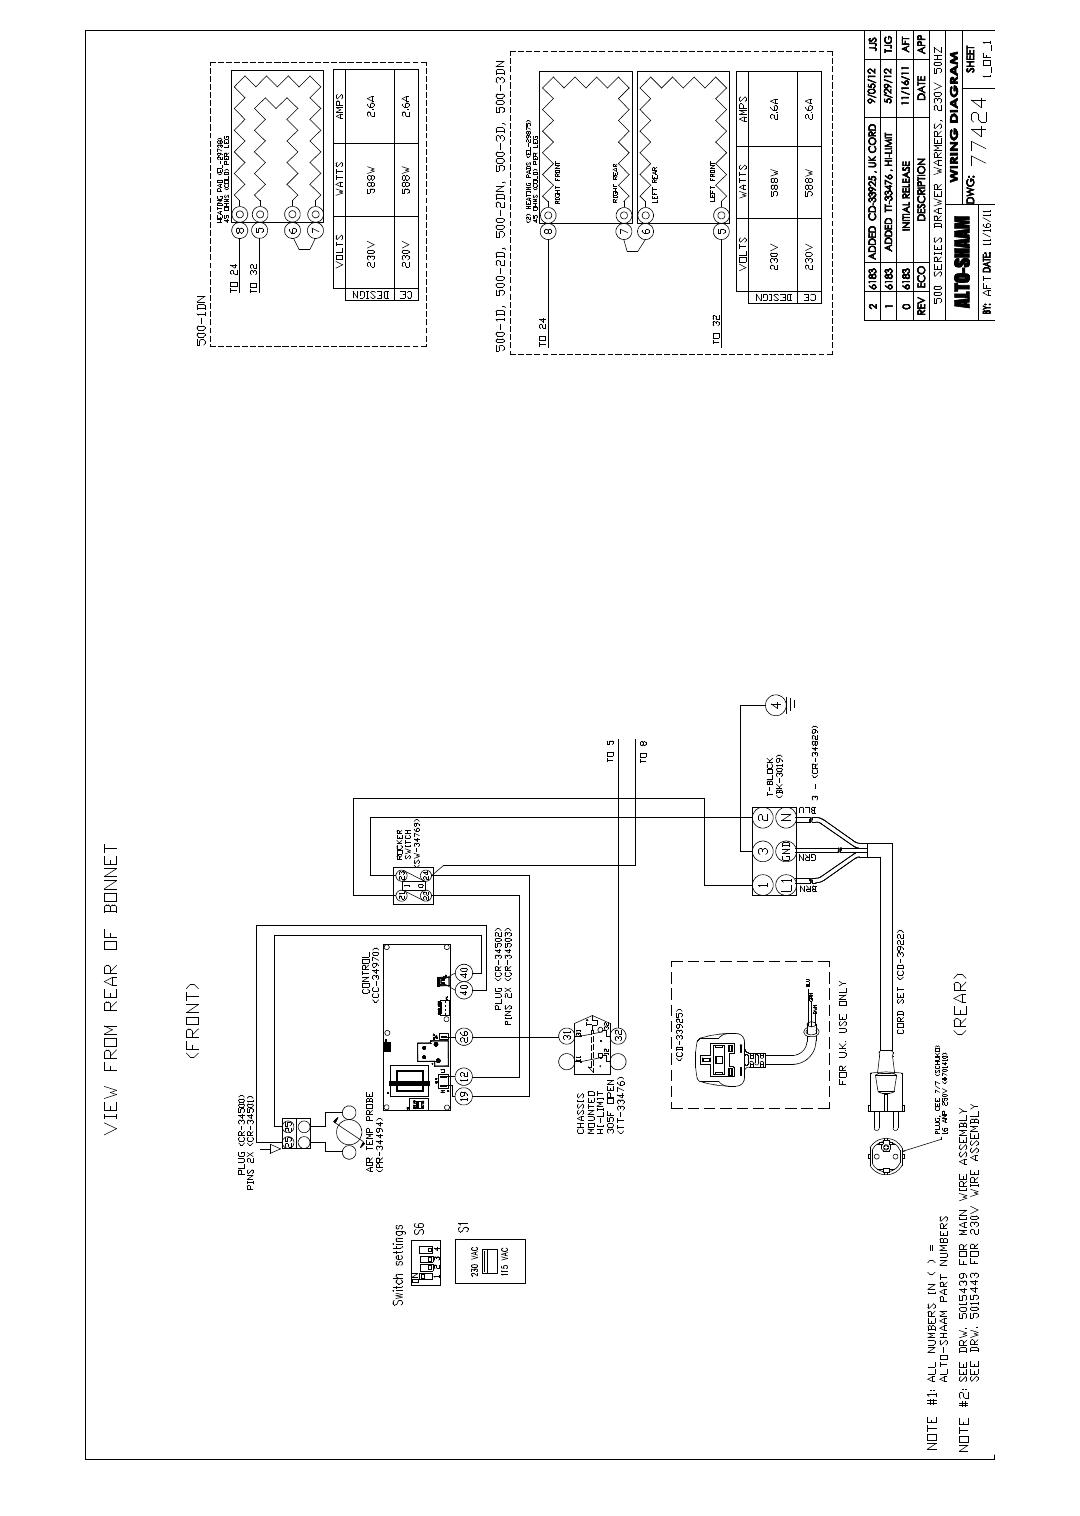 Alto Shaam 1dn Users Manual Lb75 Wiring Diagram 1 04 13 Drawer Warmer Installation Operation Service 24